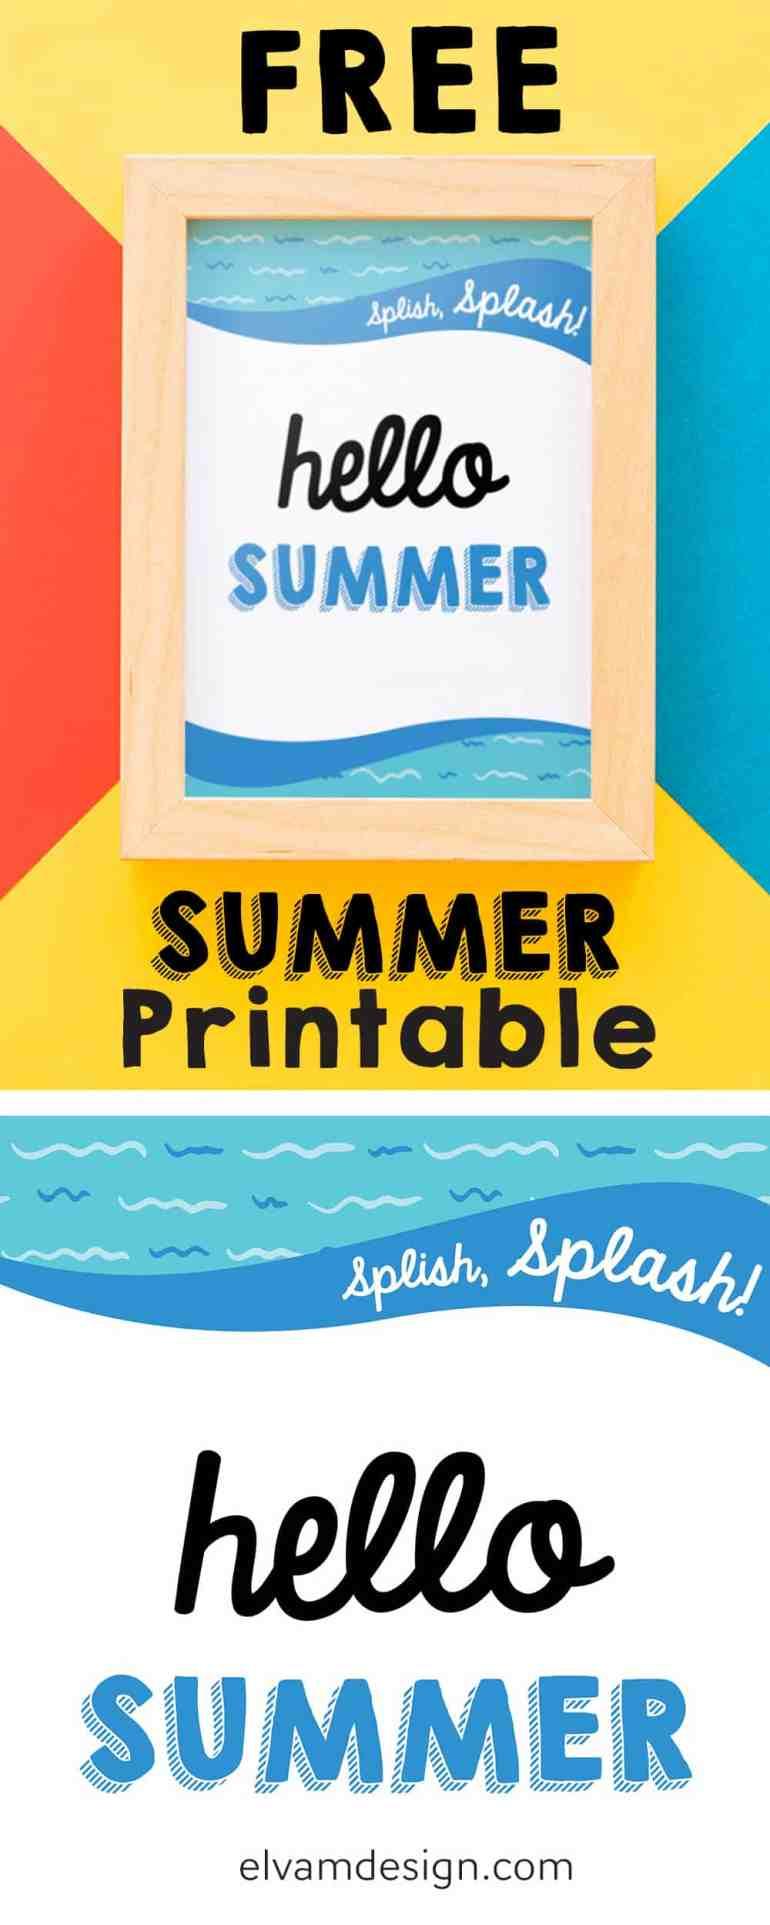 Free Summer Printable from Elva M Design Studio